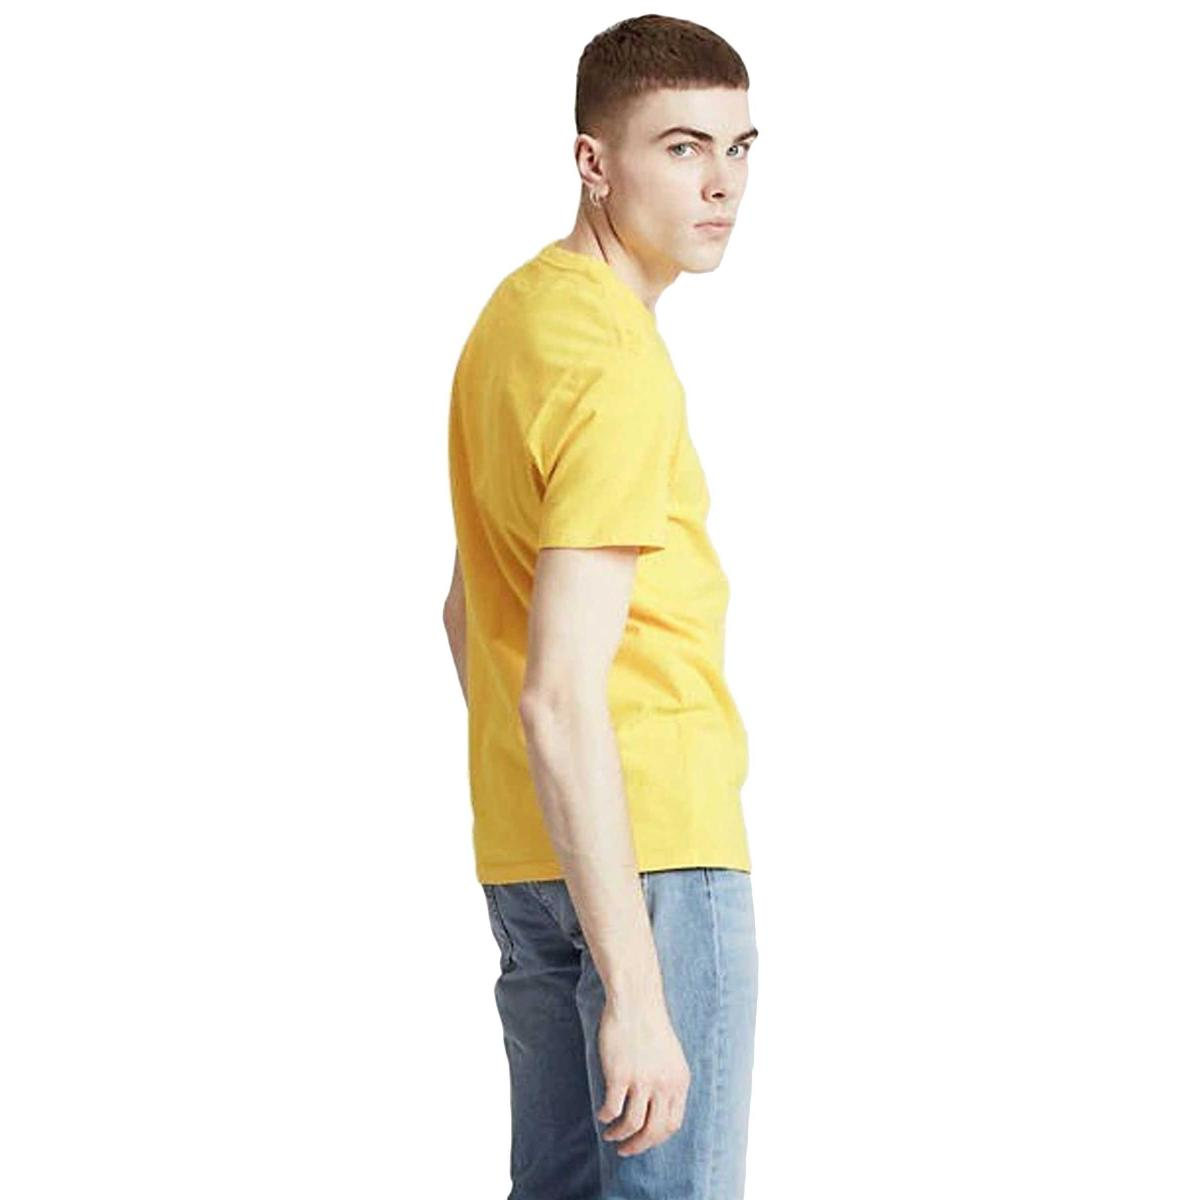 T-shirt Levi's Original Housemark Tee da uomo rif. 56605-0026